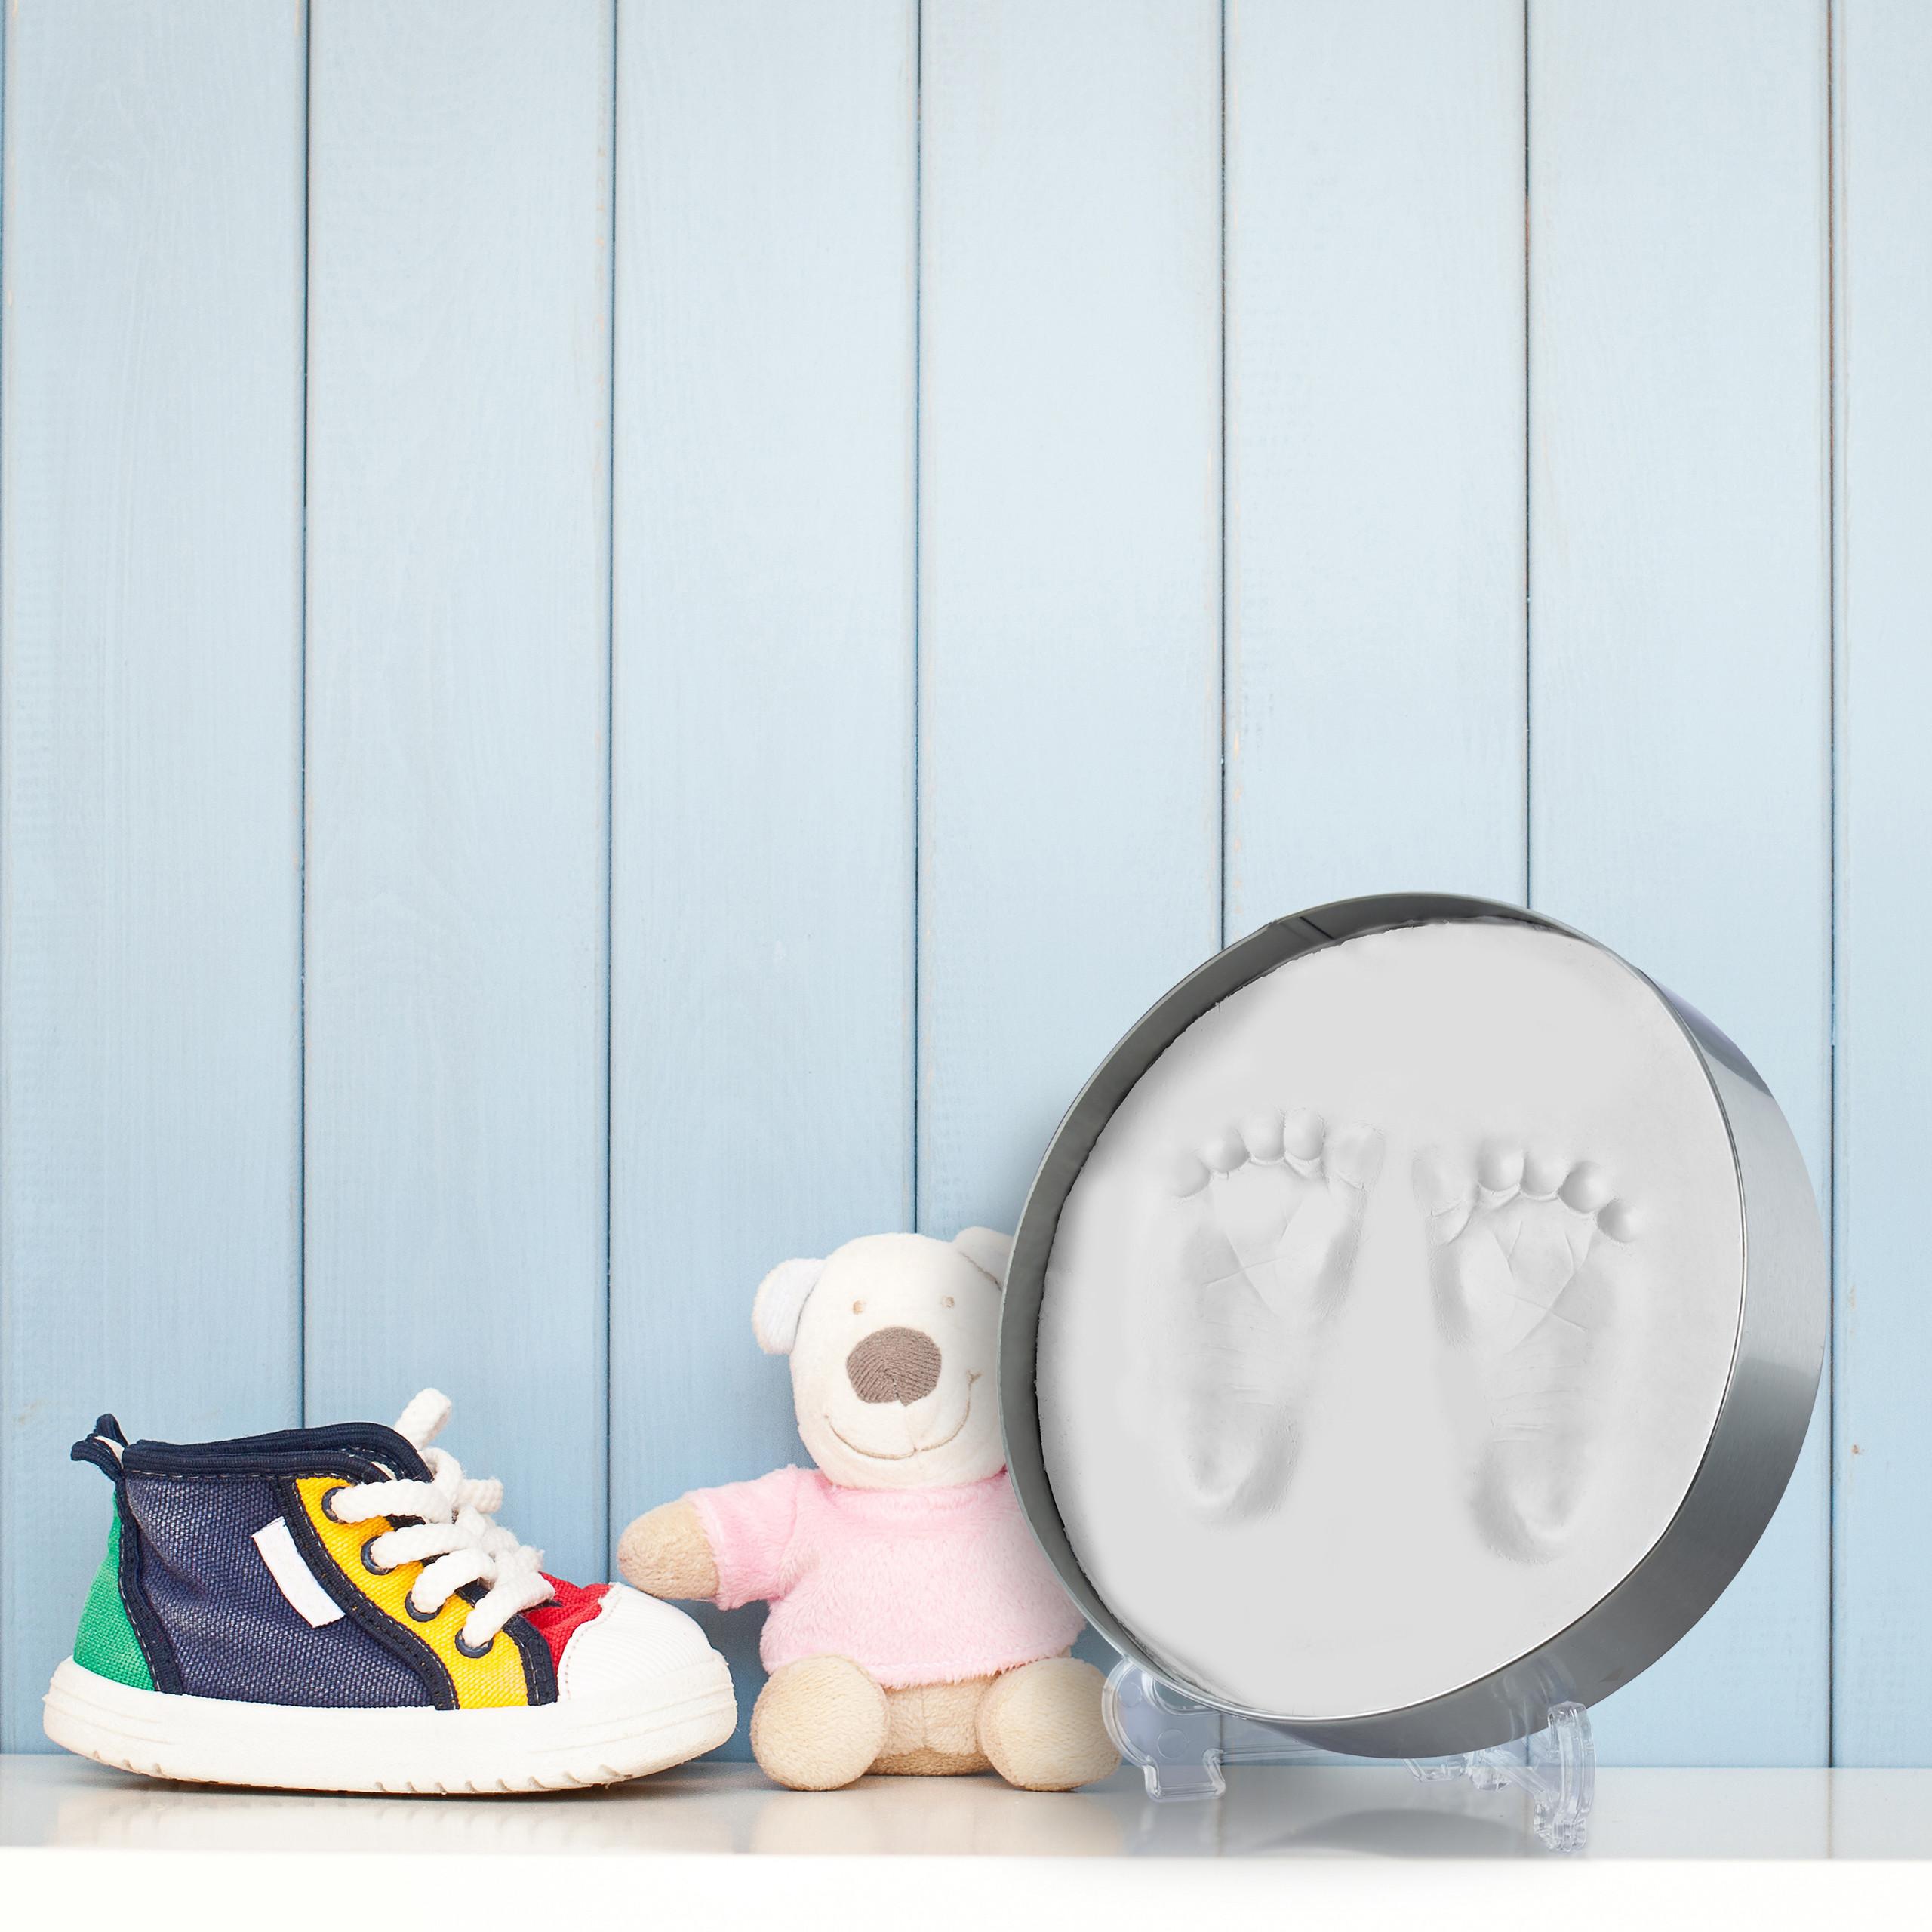 Gipsabdruck-Baby-Gipsabdruckset-Fussabdruck-Handabdruck-Babyabdruck-Set-Gips Indexbild 4